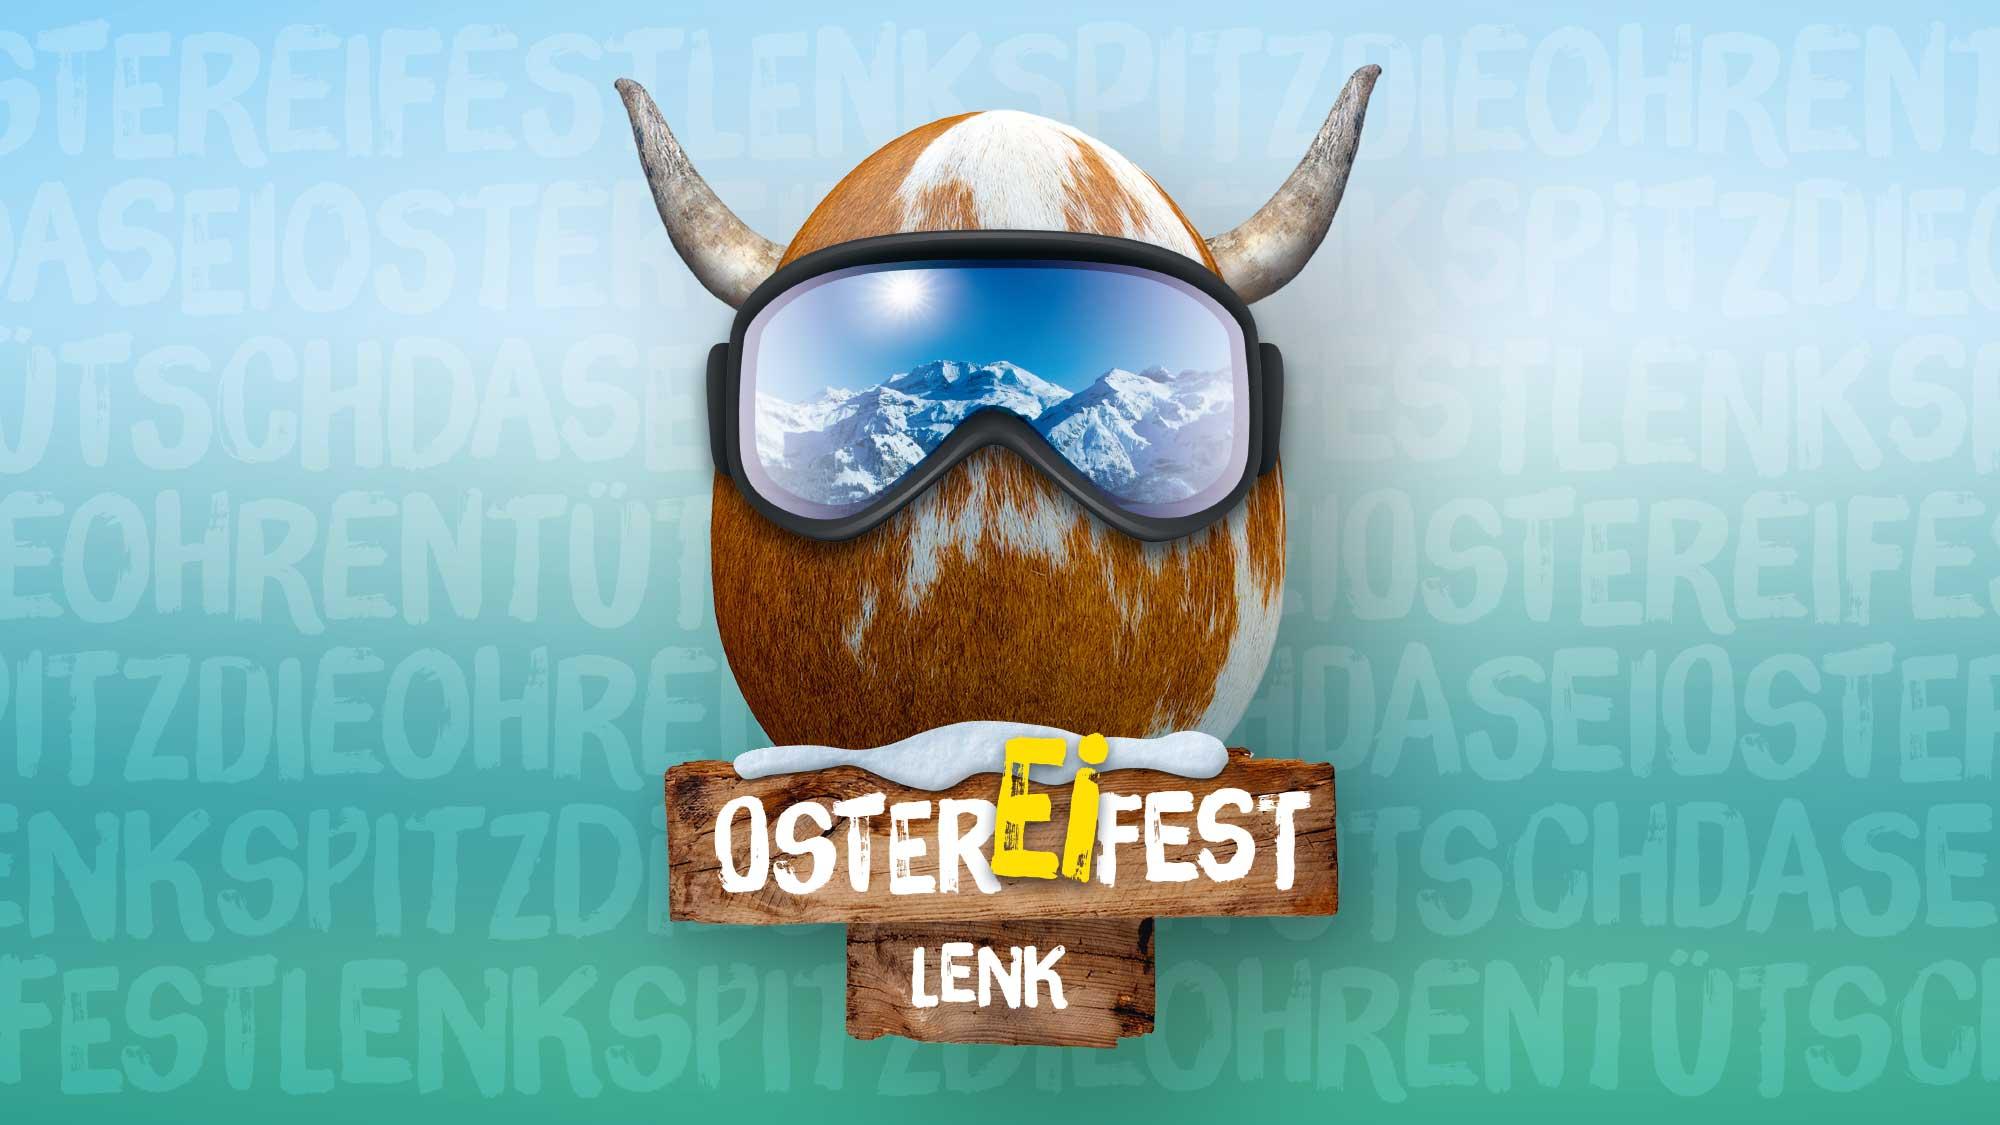 Lenk-Simmental Tourismus: OsterEiFest